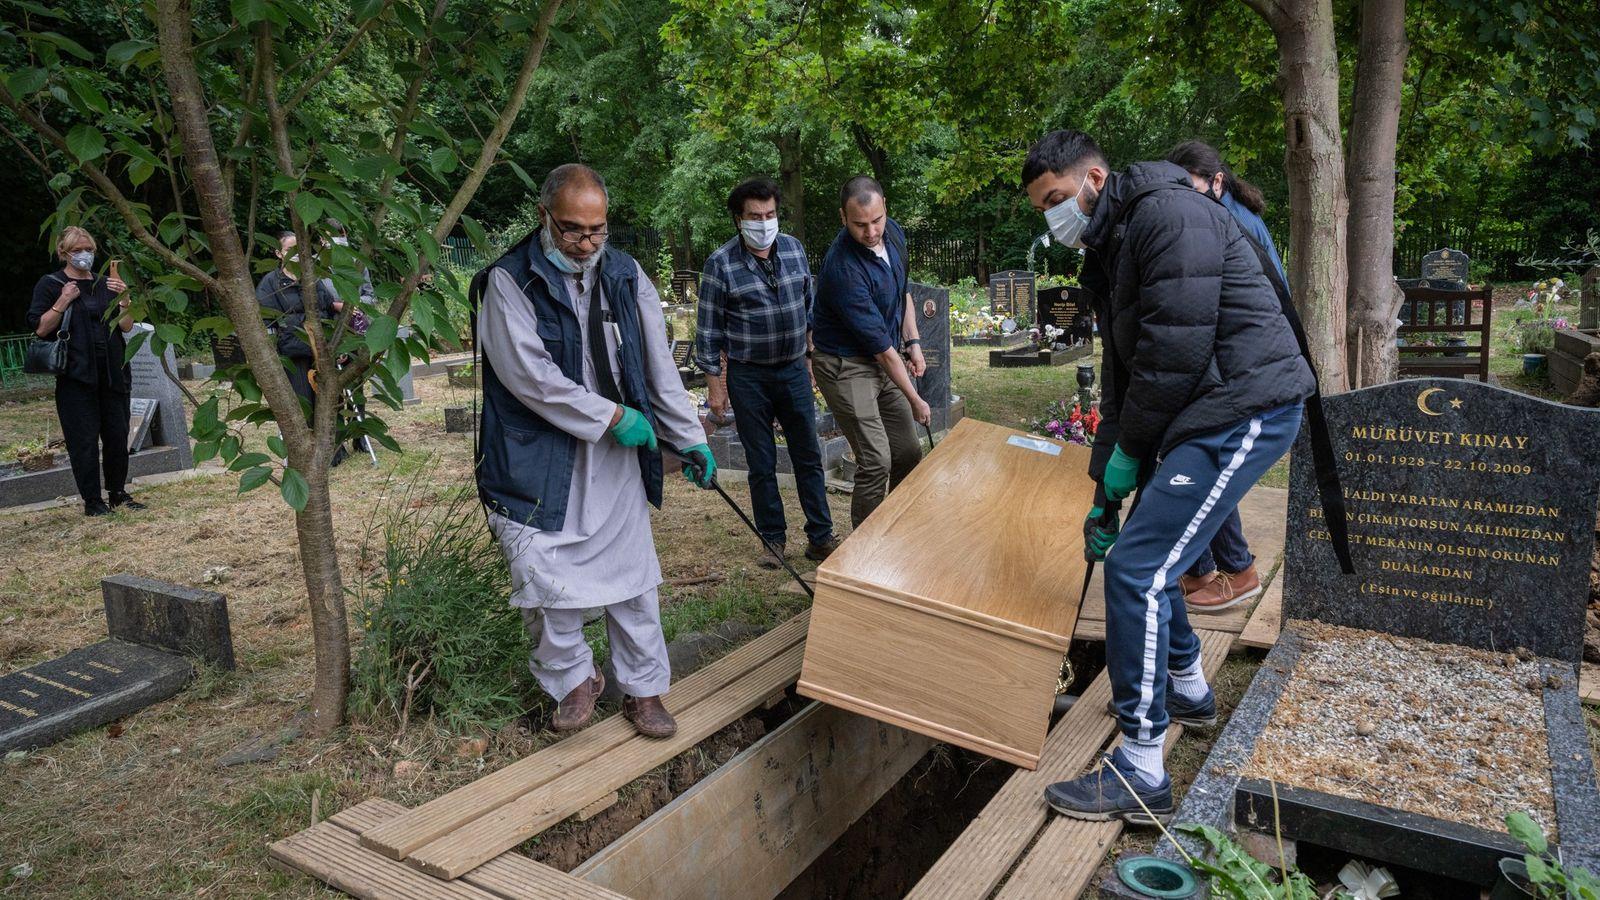 Mohammed Tariq and Zain Muhammed bin Farooq help bury Ali Ilhan Kinay, a 91-year-old man who ...